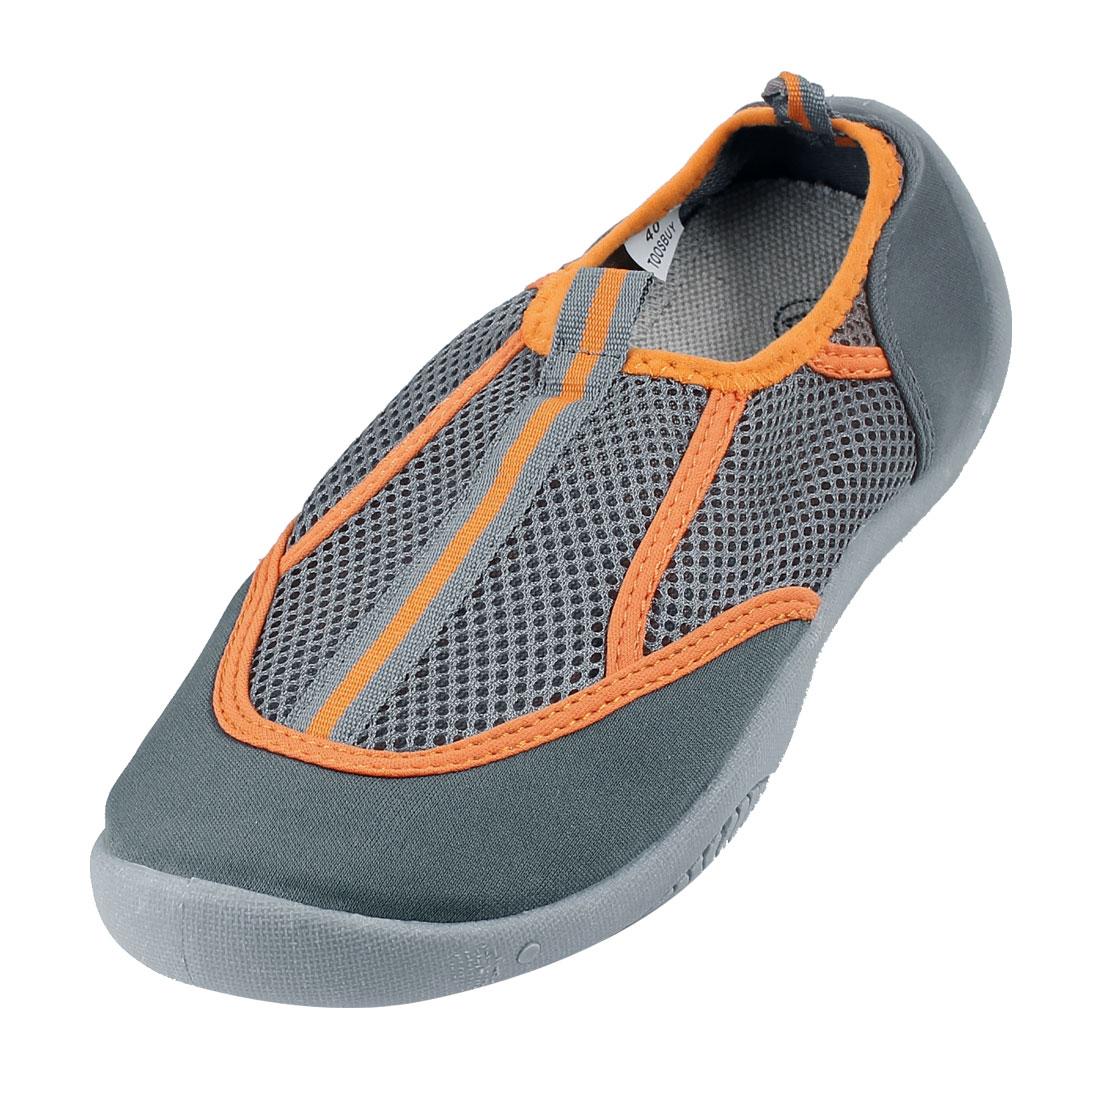 Gray Orange Non-skid Sole Low Platform Flat Beach Mesh Shoes US 7.5 for Women